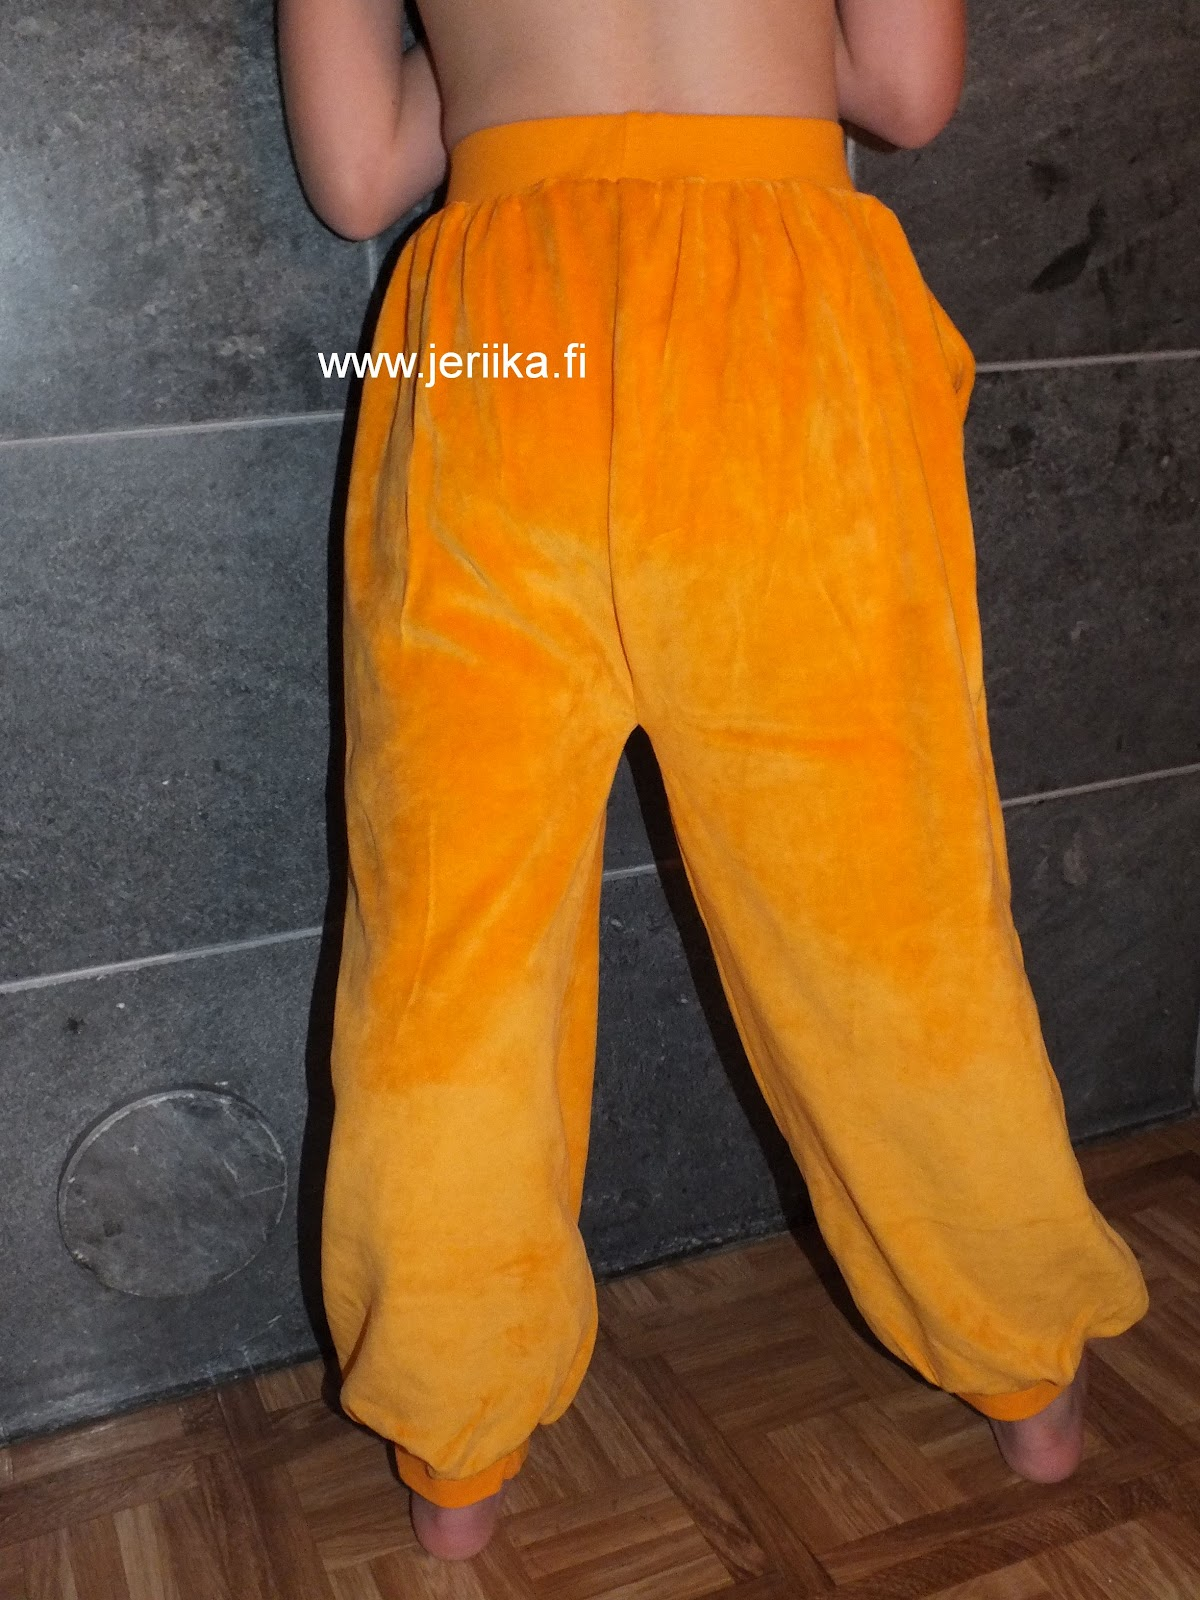 Jeriika - lastenvaatteet  Maxomorra baggy pants sekä uutuuksia 03a0b4acf2